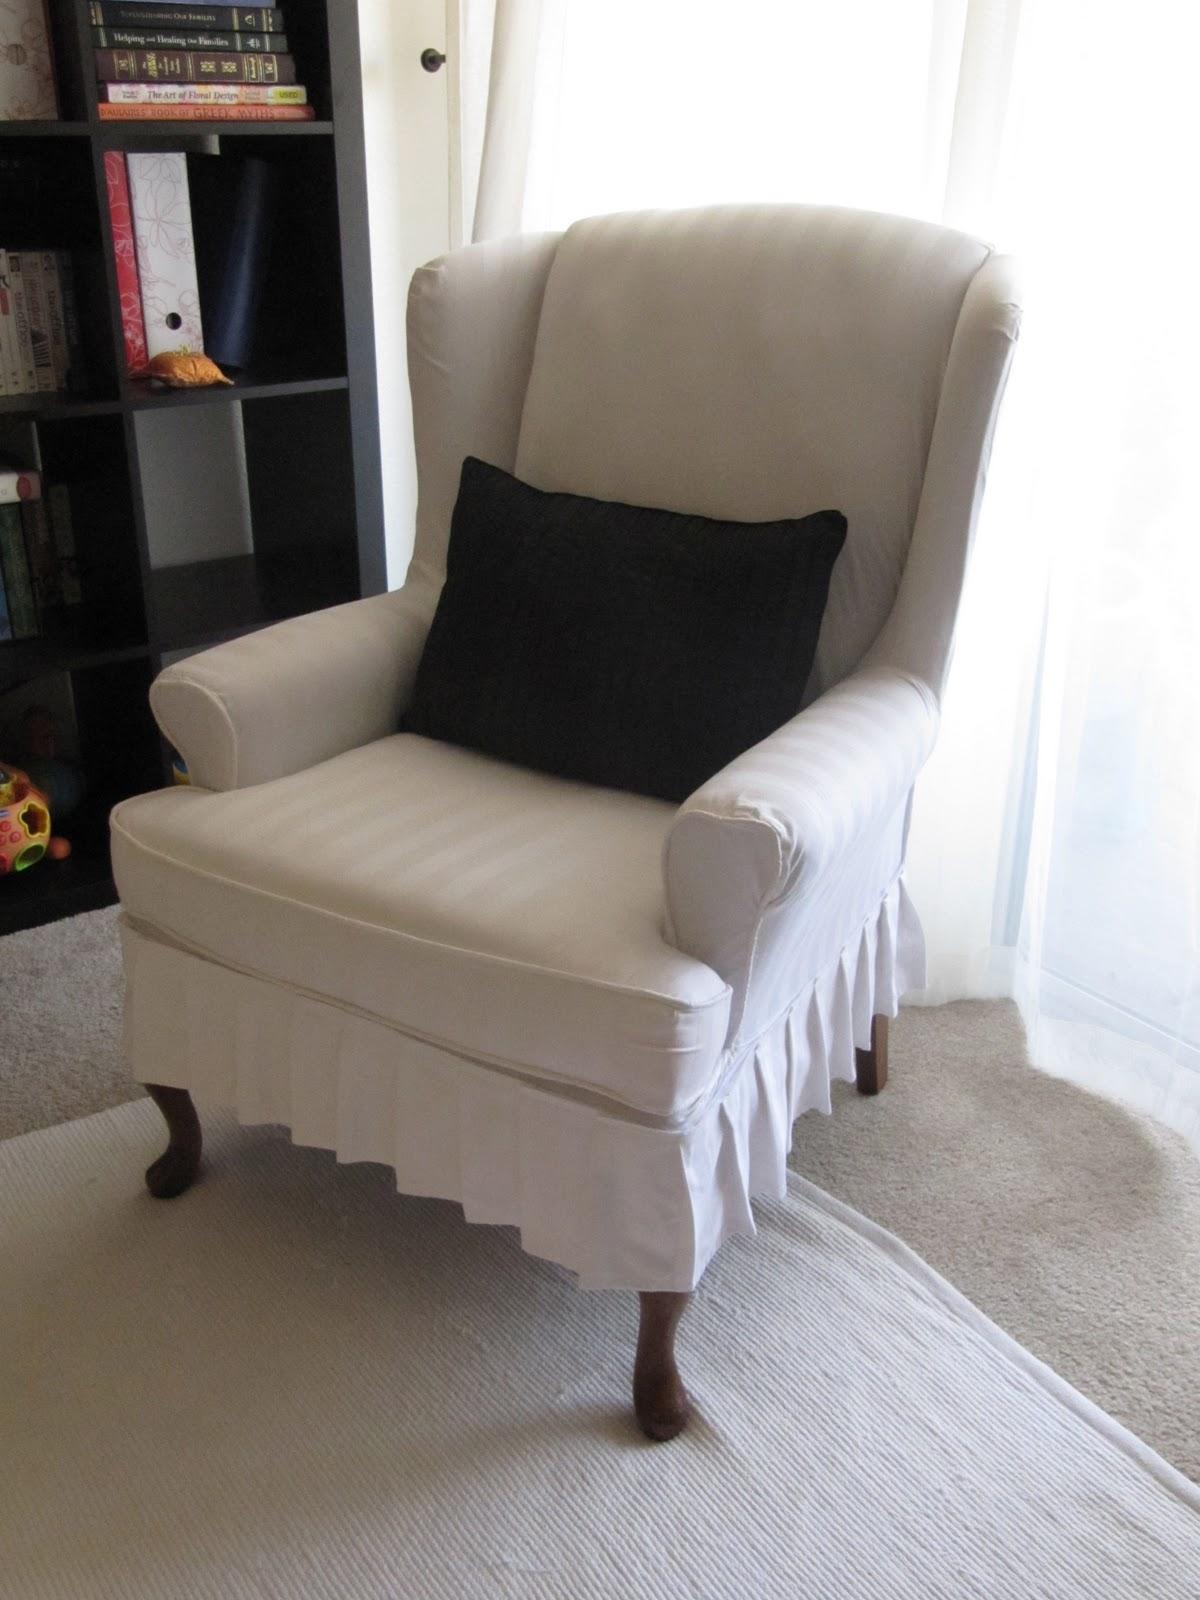 office chair covers to buy uk ltd birmingham white slipcovered ideas homesfeed